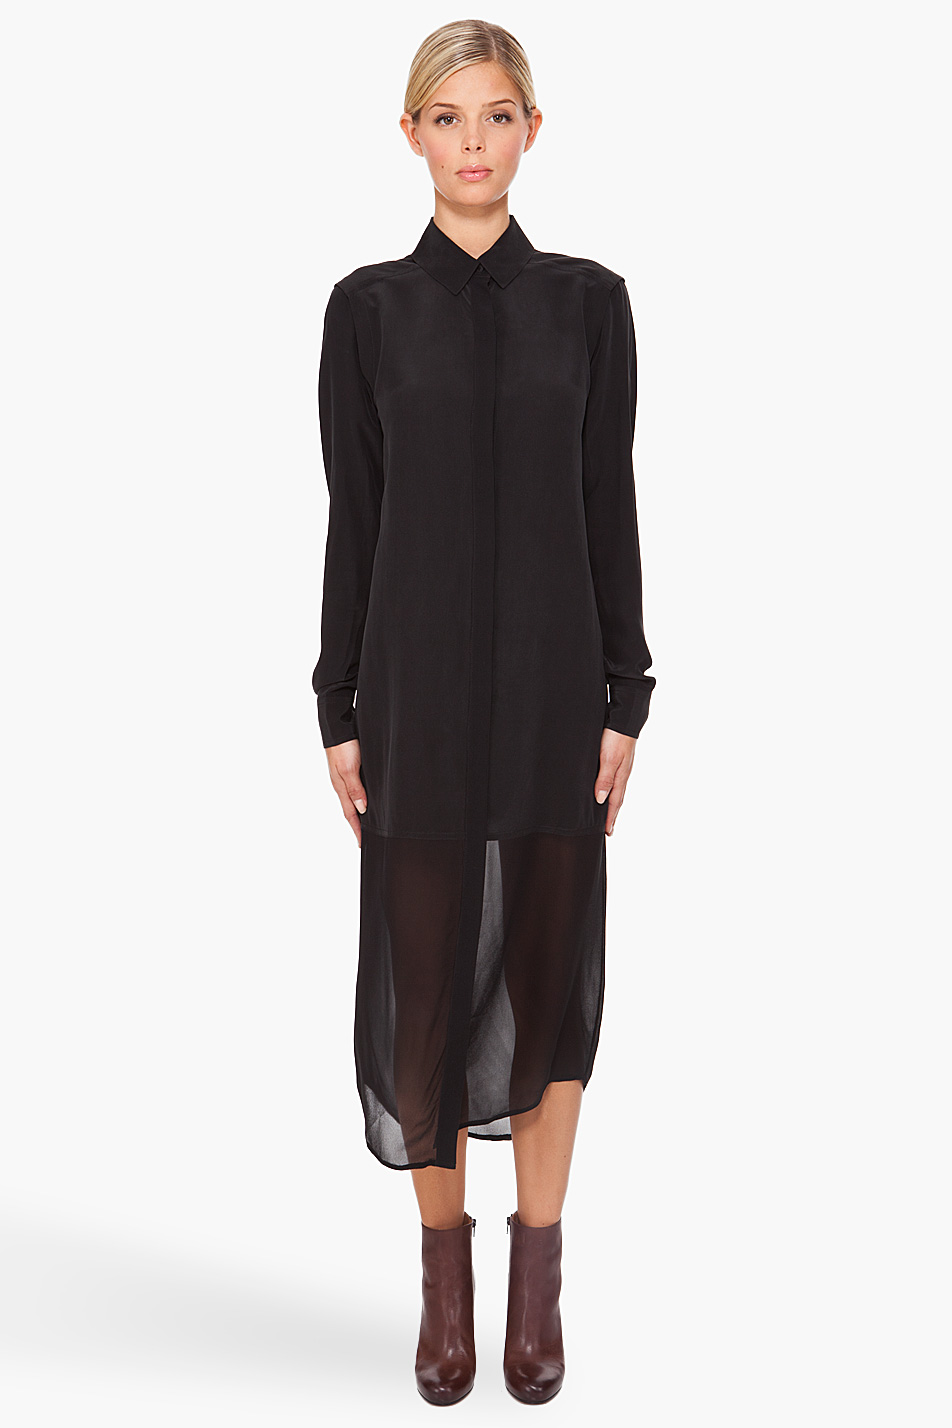 T by alexander wang Half-sheer Shirt Dress in Black   Lyst